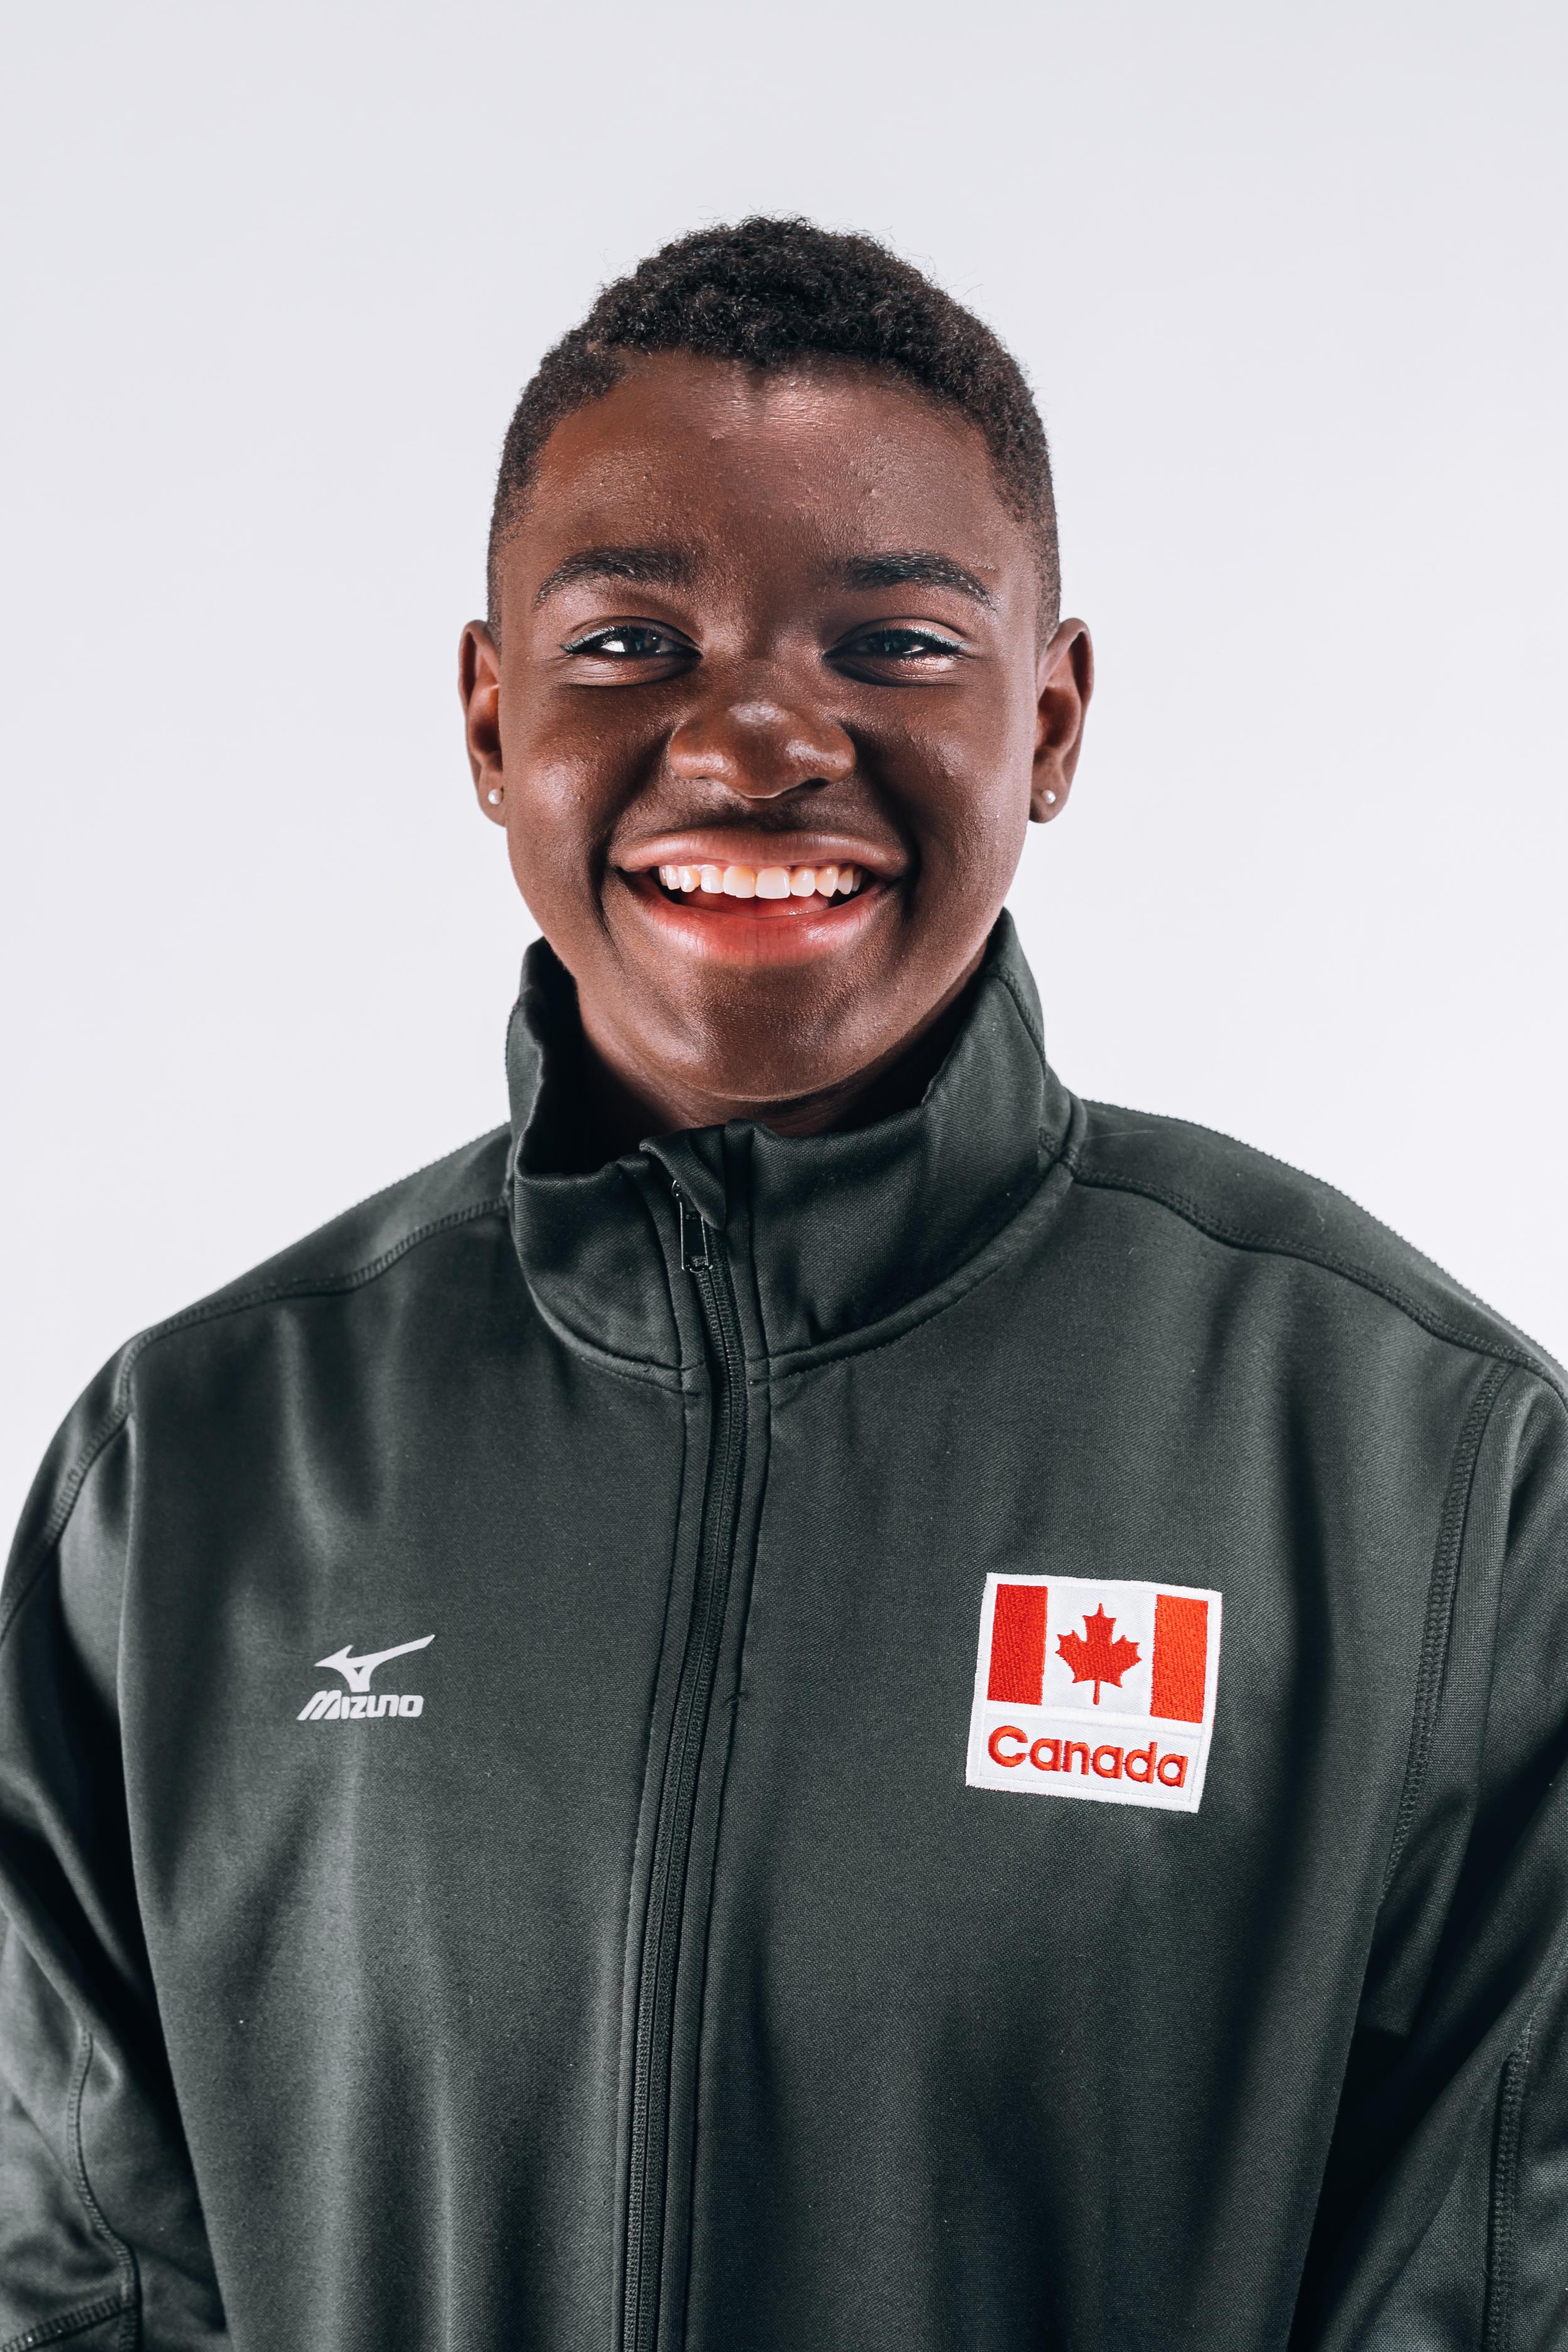 Exterior: Volleyball Canada